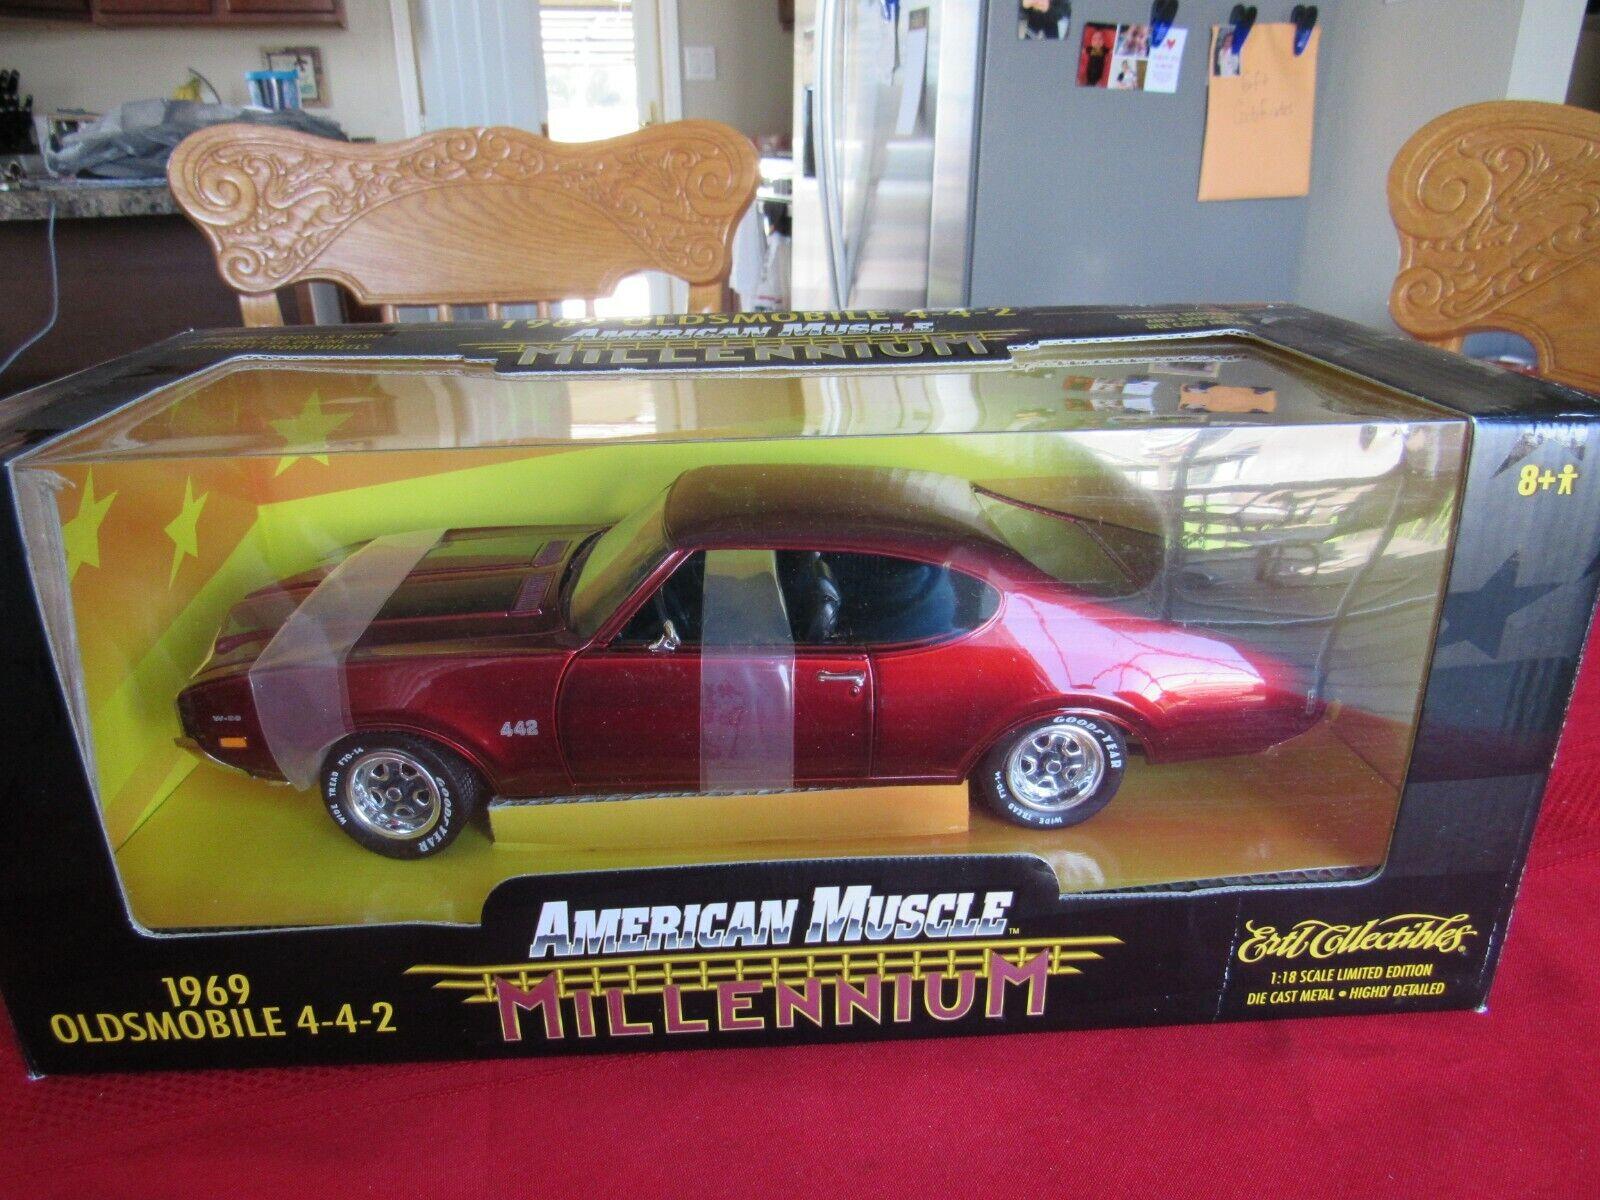 NIB American Muscle Millenium 1969 Oldsmobile 4-4-2 1 18-Candy Apple rot